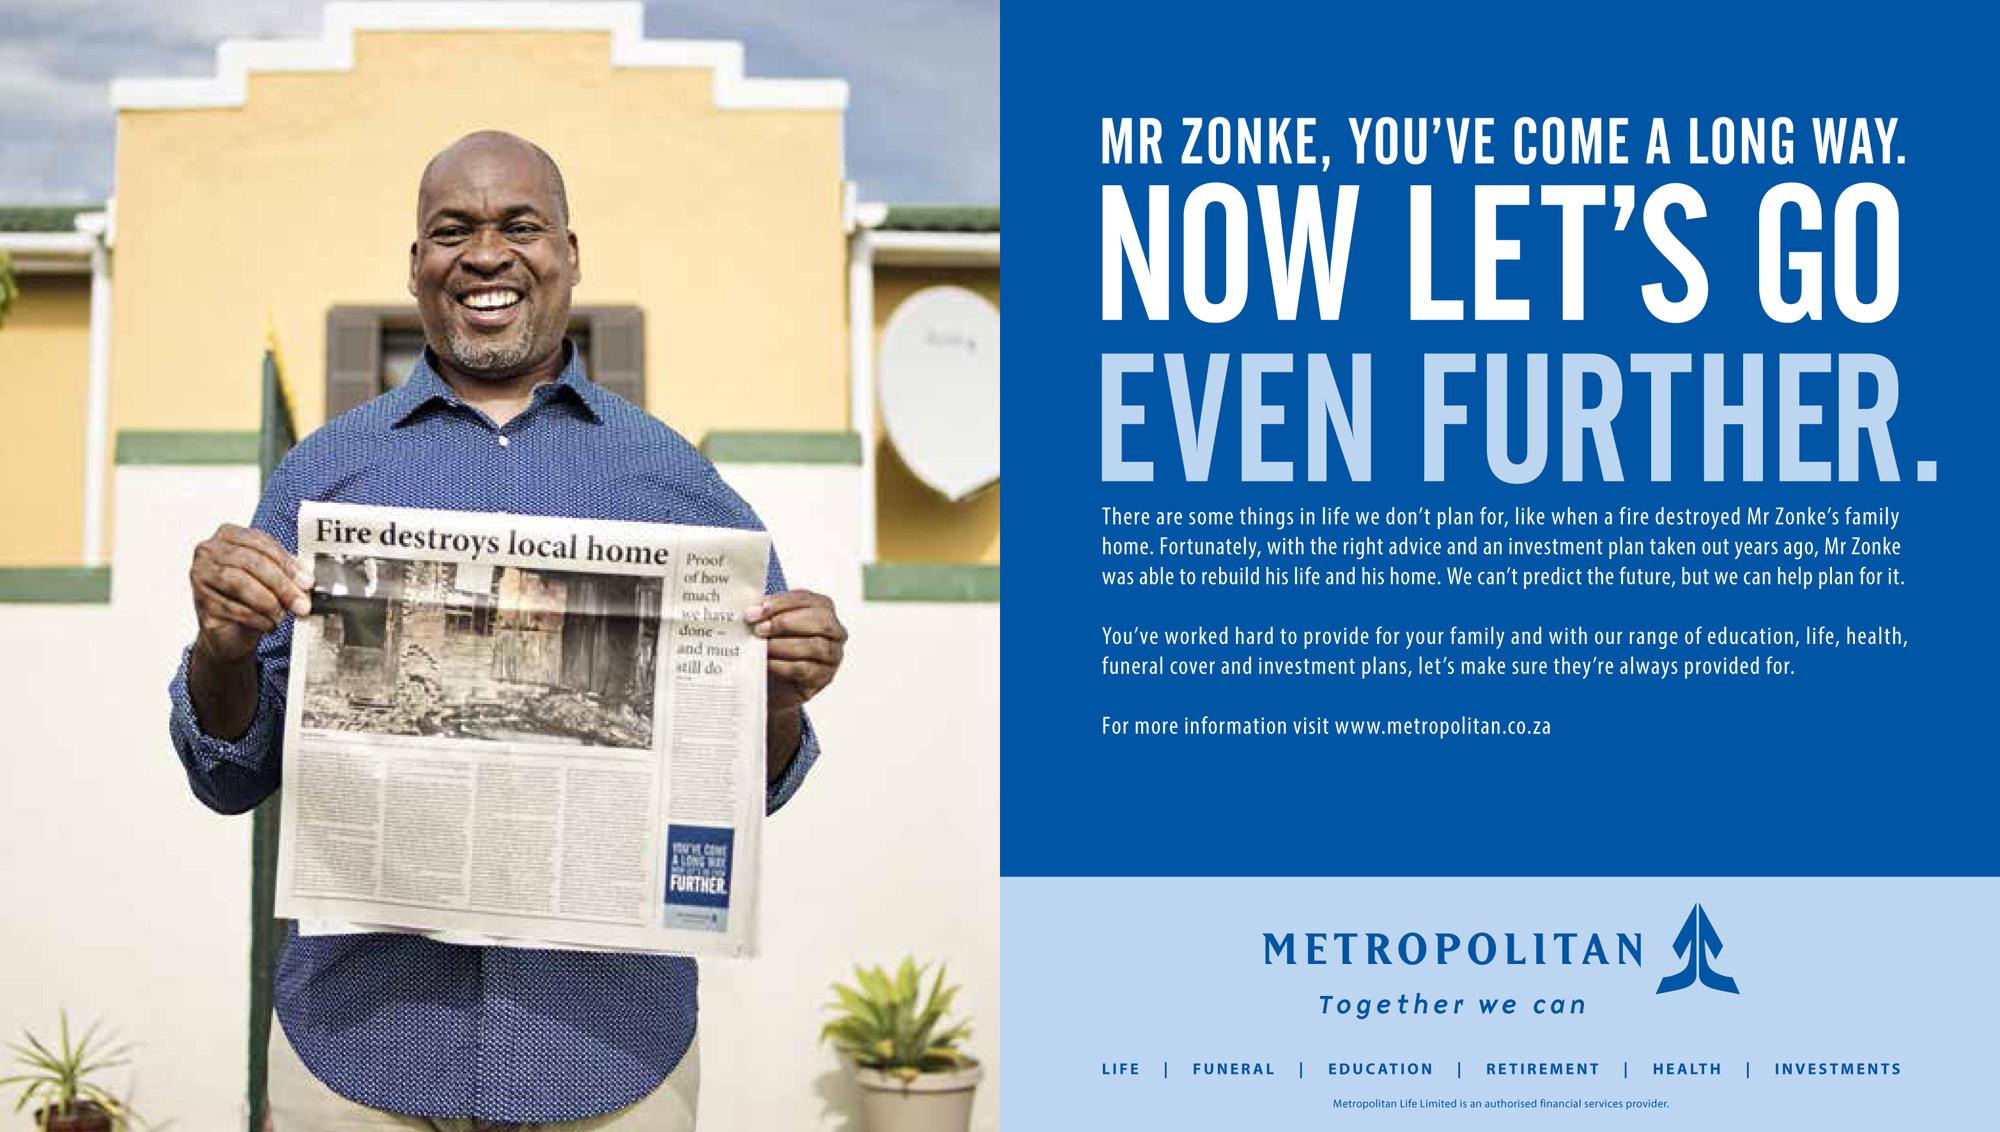 09Advertising 1. Metropolitan Insurance.jpg